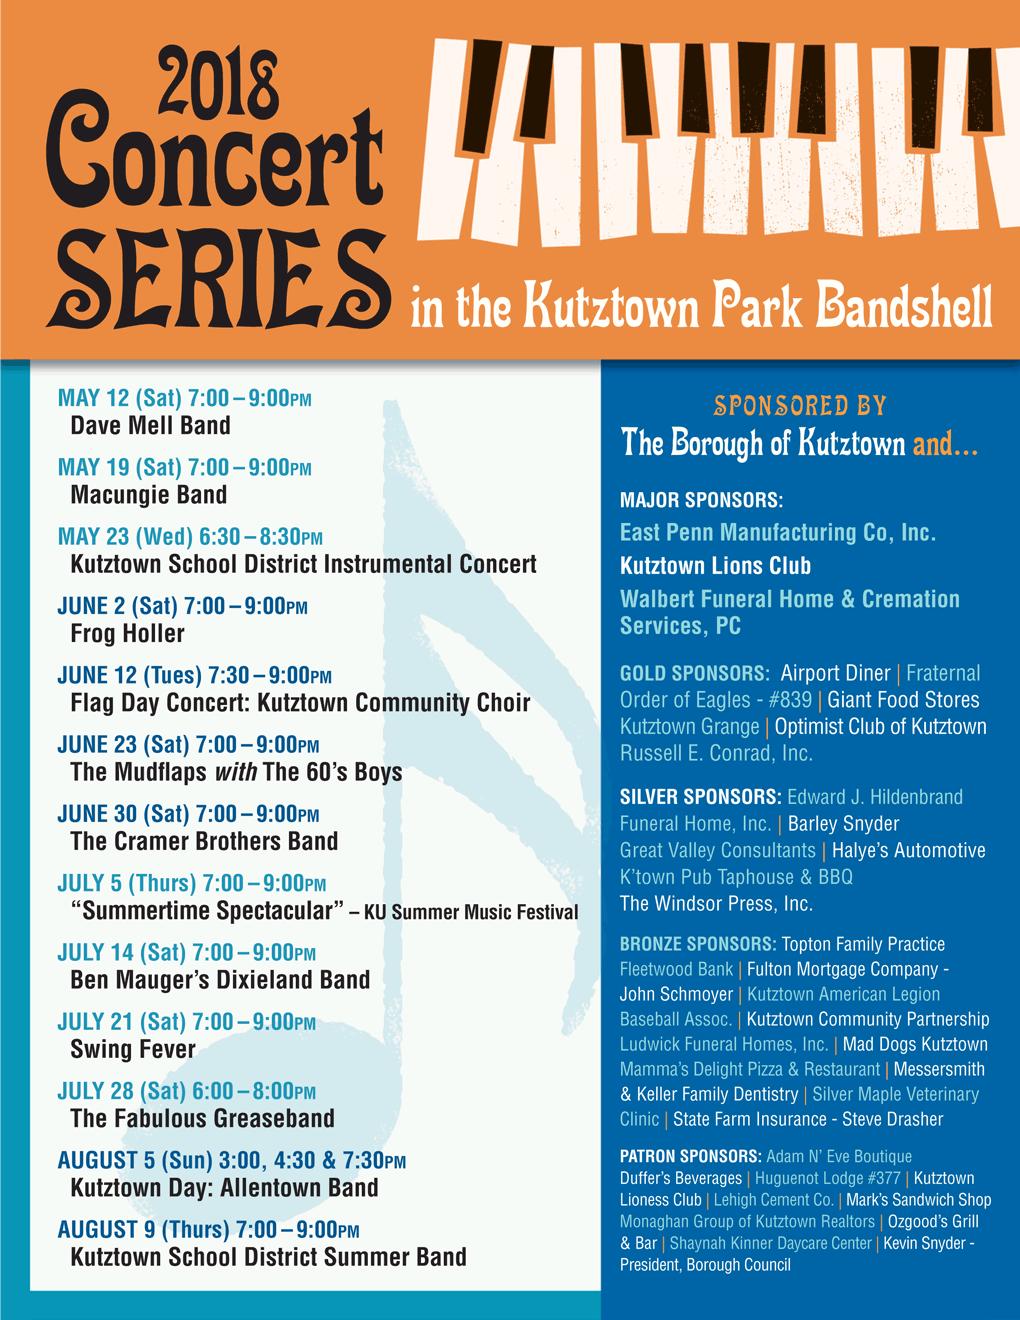 ConcertSchedule_2018_flyer_web.png